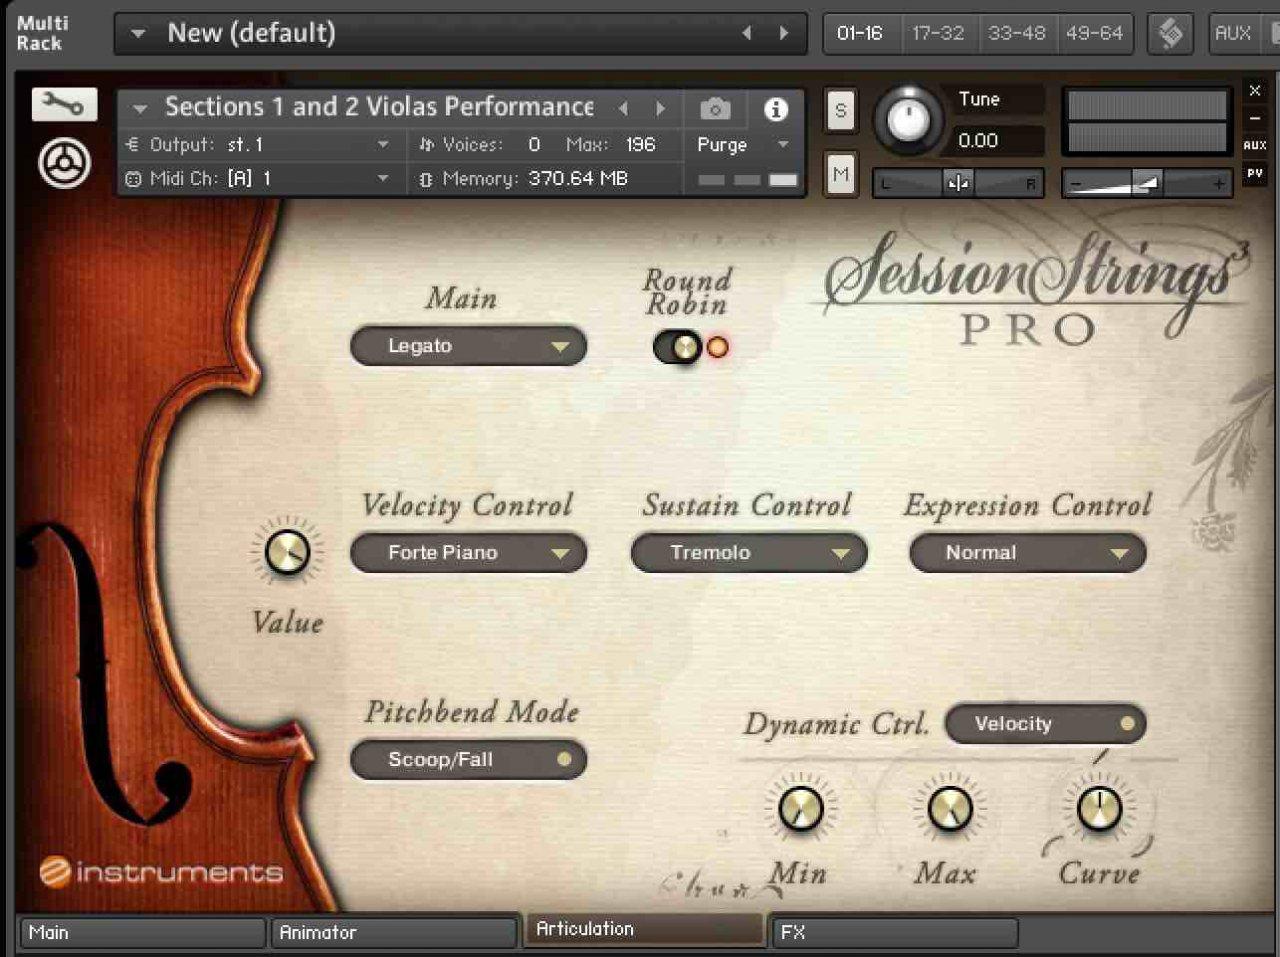 Native Instruments - Session Strings Pro KONTAKT Library